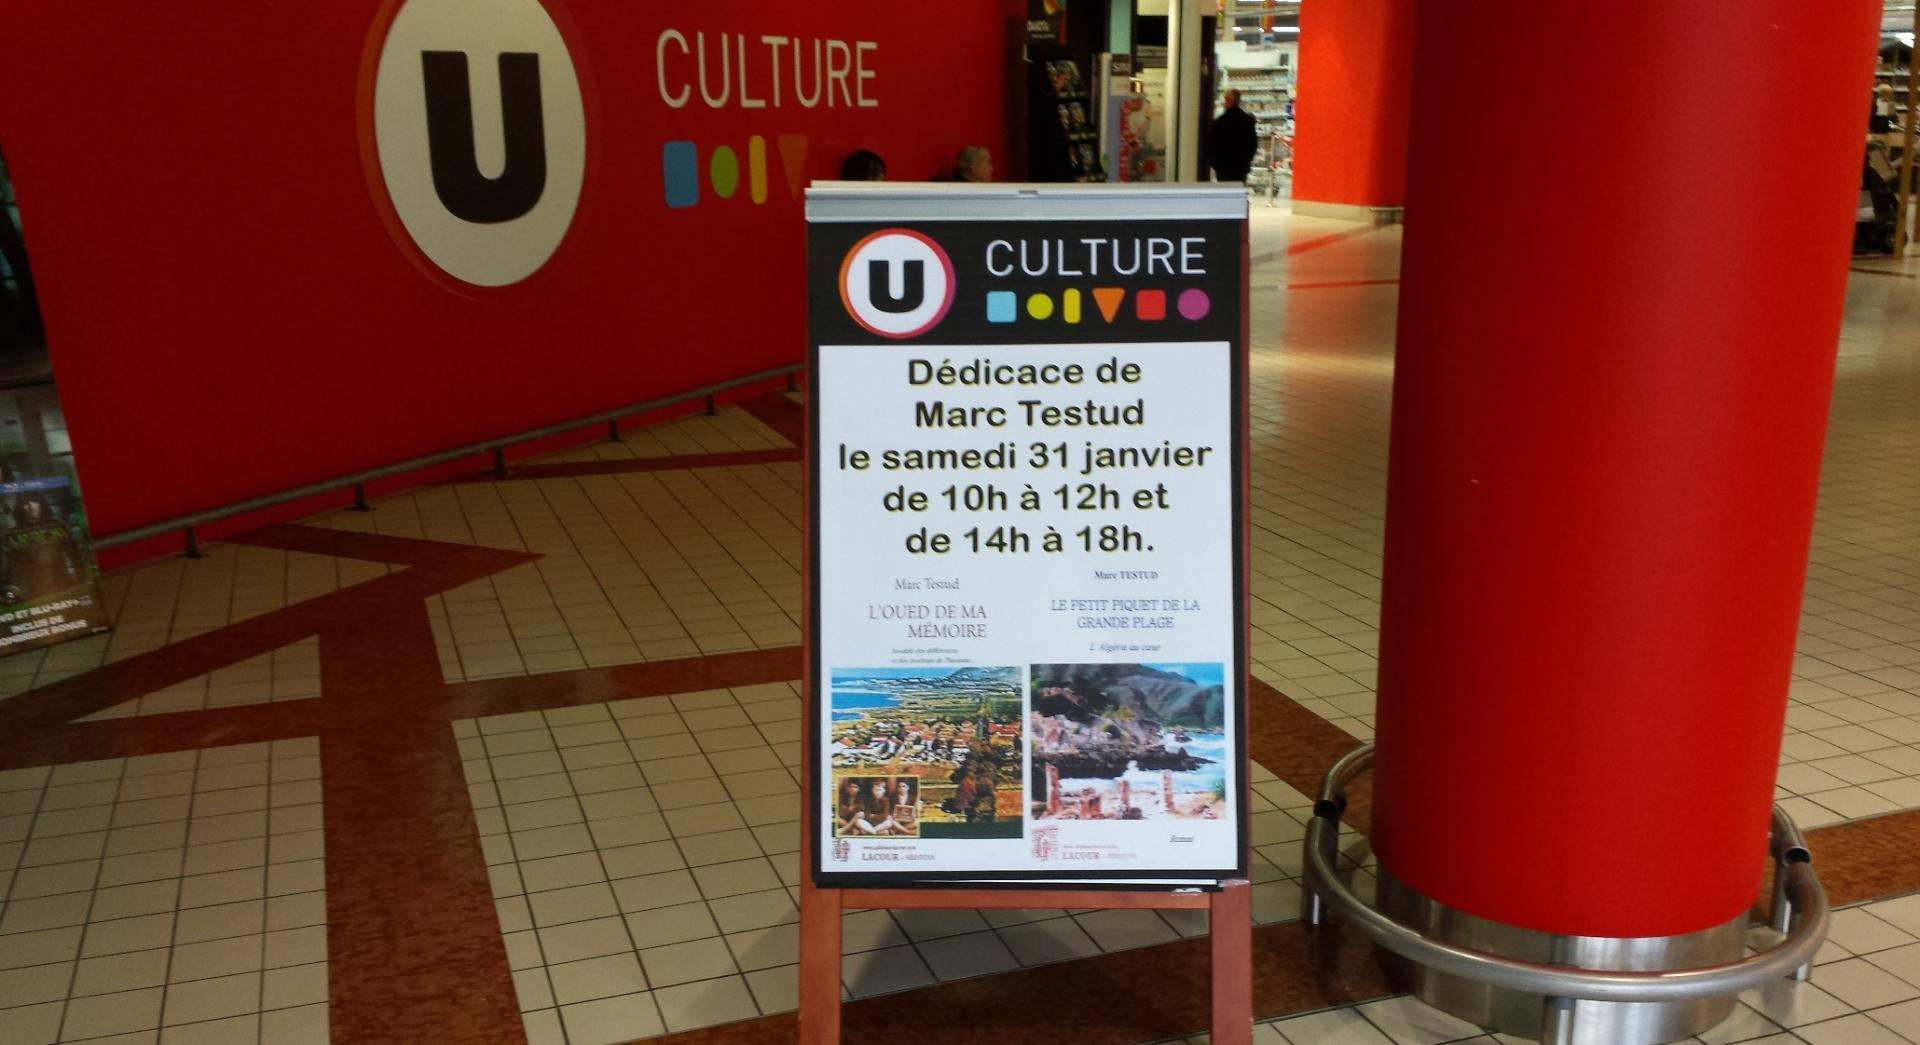 dédicace à Culture U de Gujan Mestras